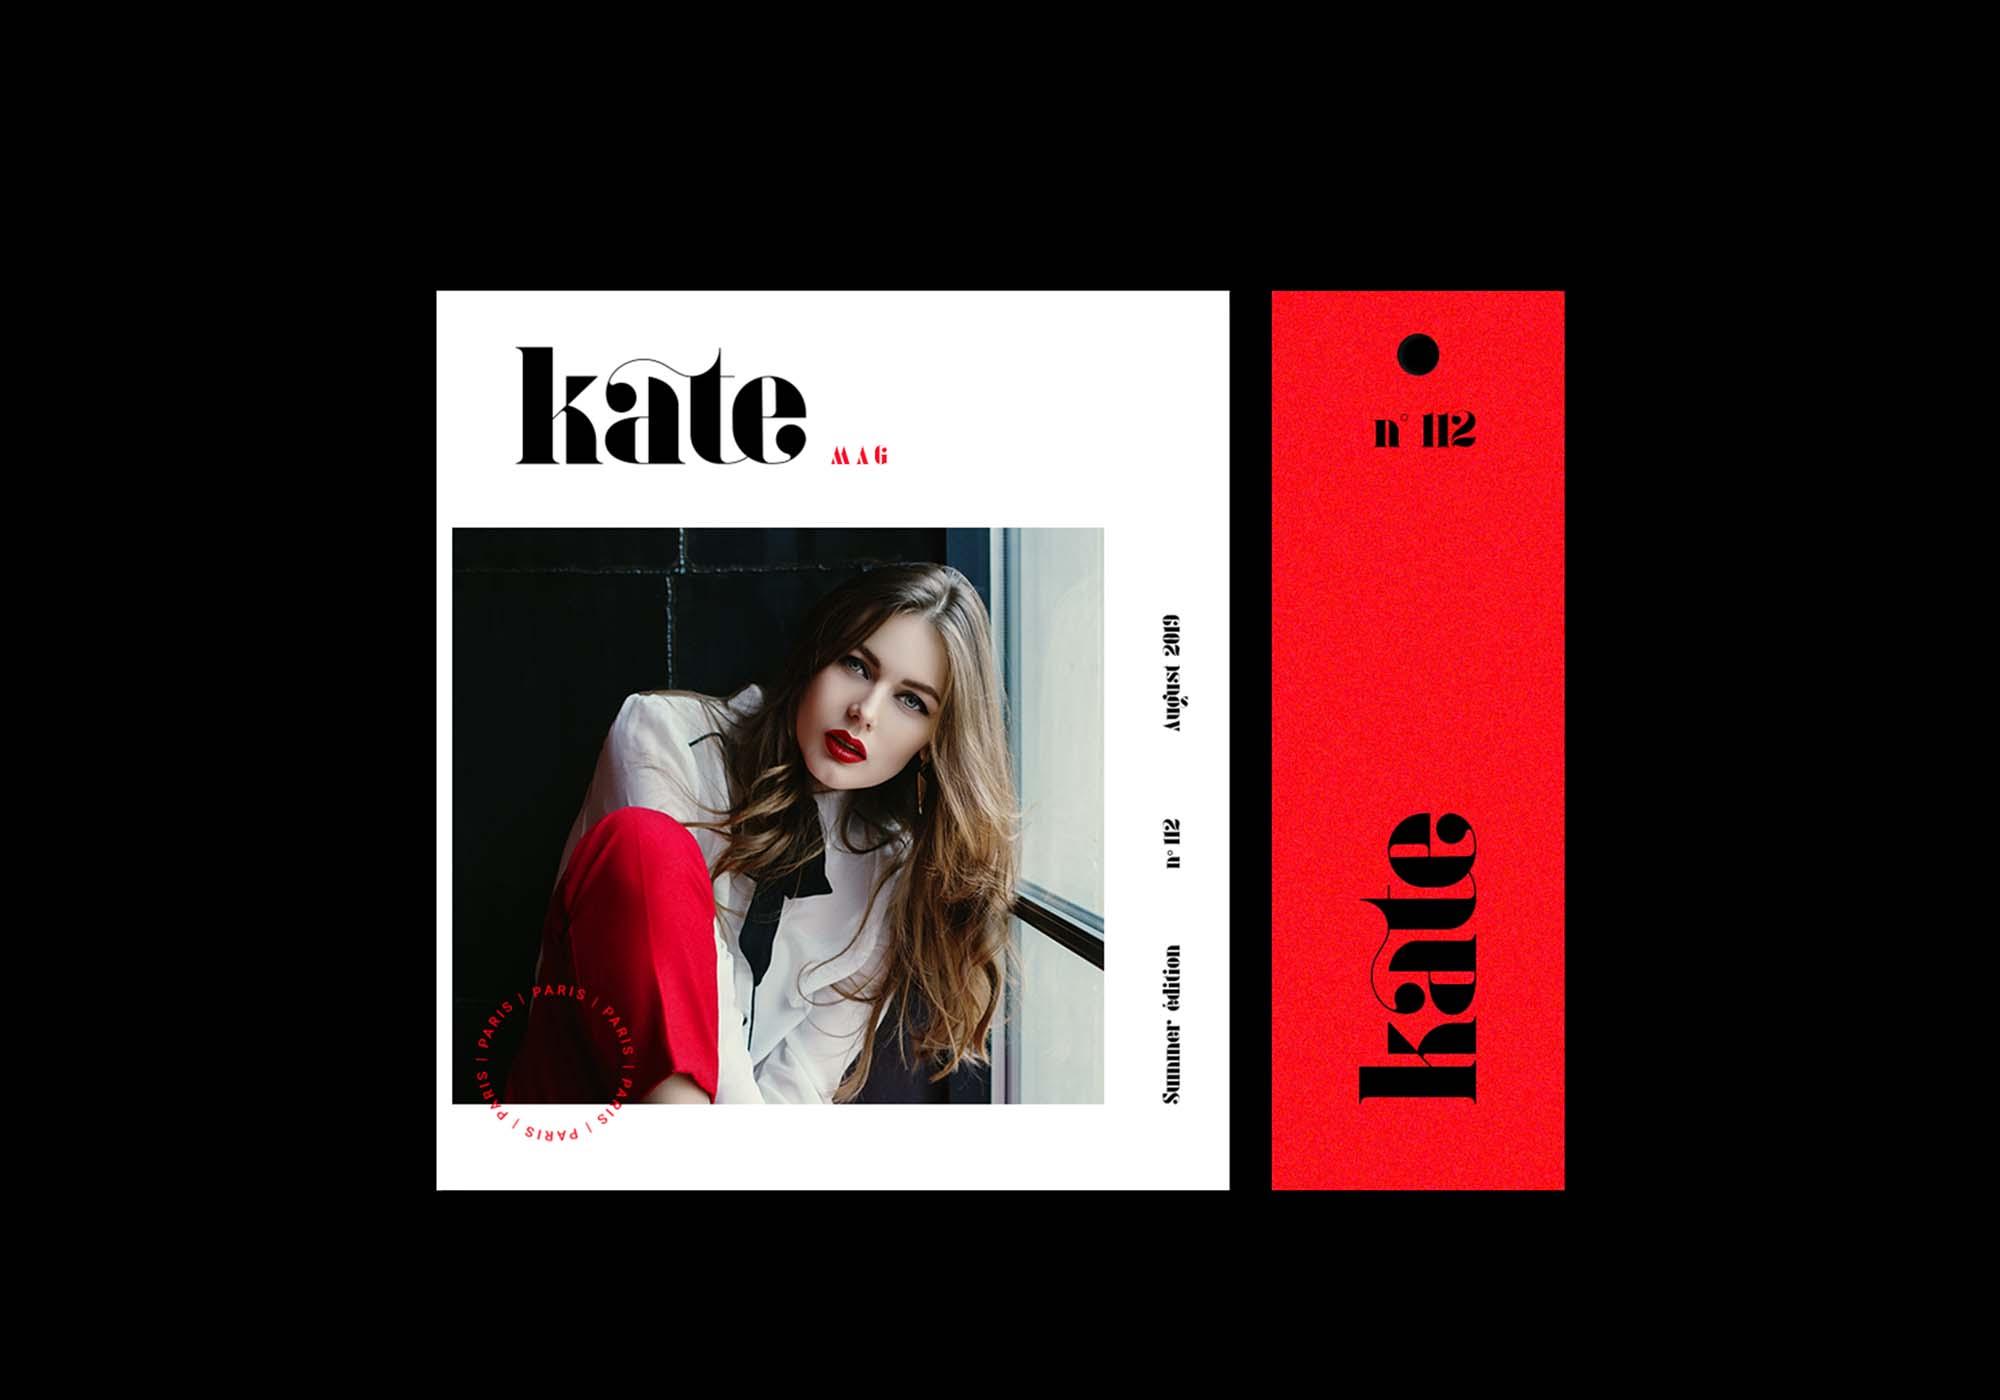 Kate Font Uses